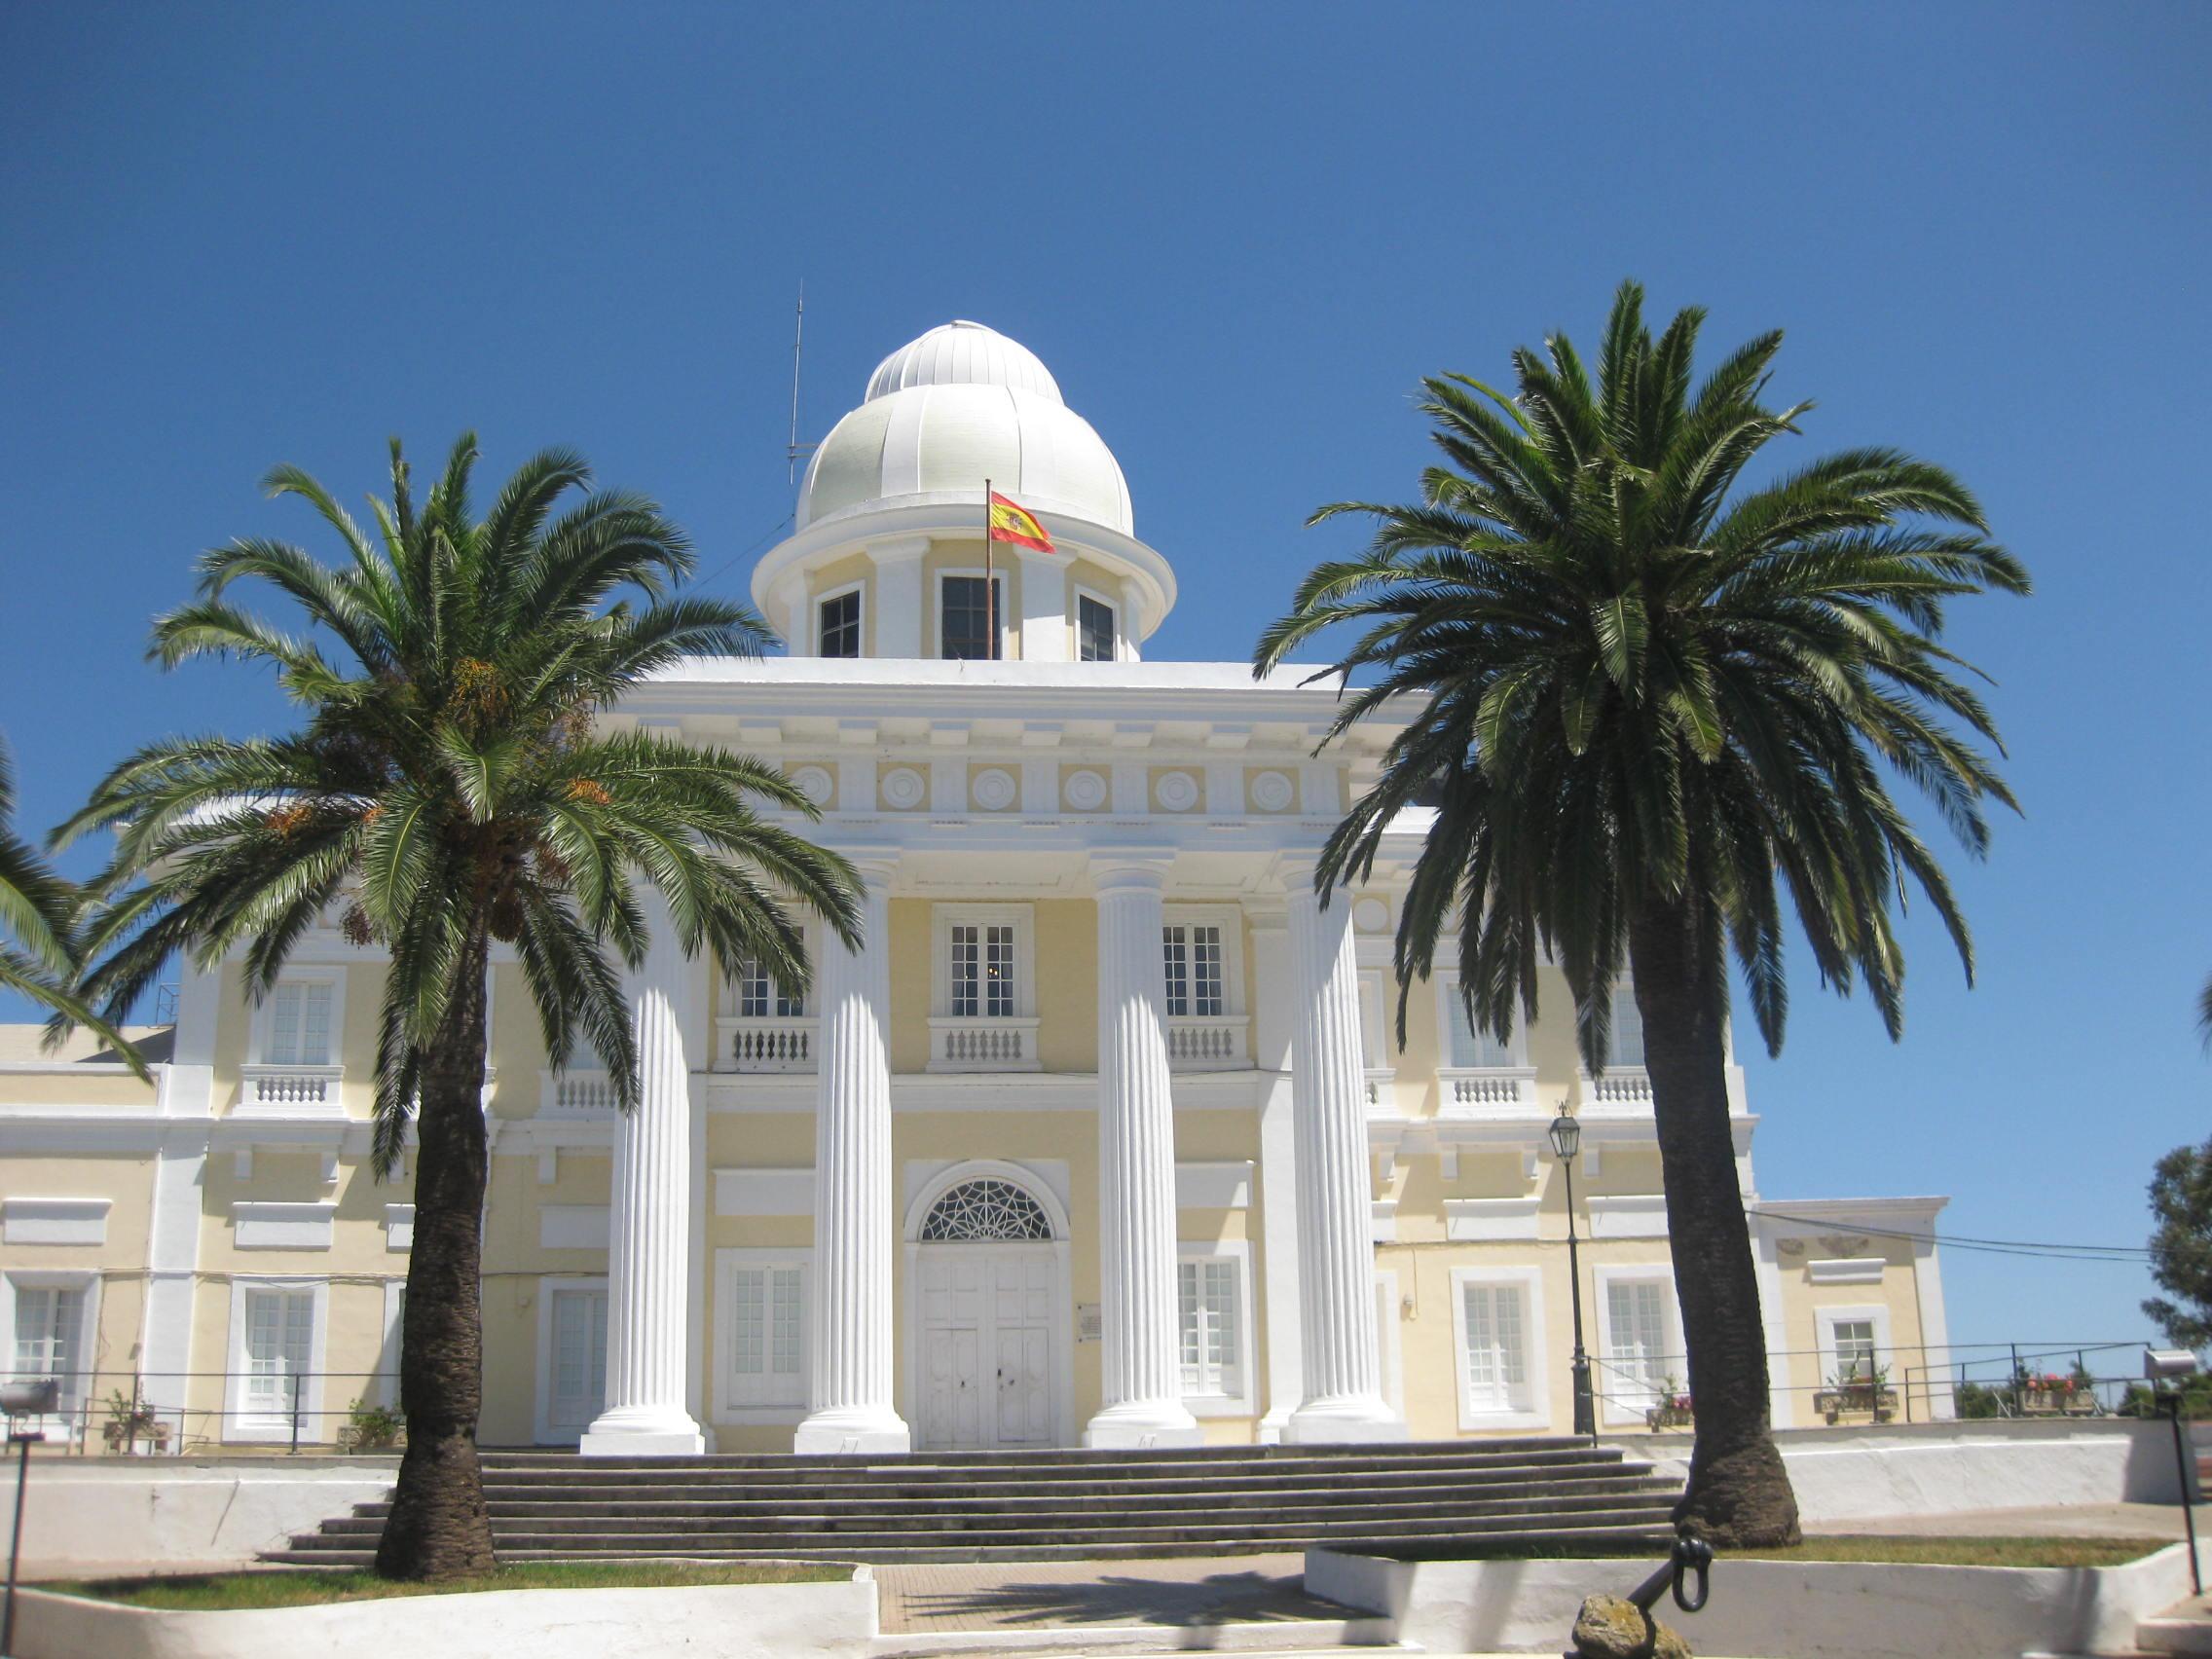 http://upload.wikimedia.org/wikipedia/commons/6/63/Real_Observatorio_Astron%C3%B3mico_de_la_Marina.San_Fernando._C%C3%A1diz._Espa%C3%B1a.jpg